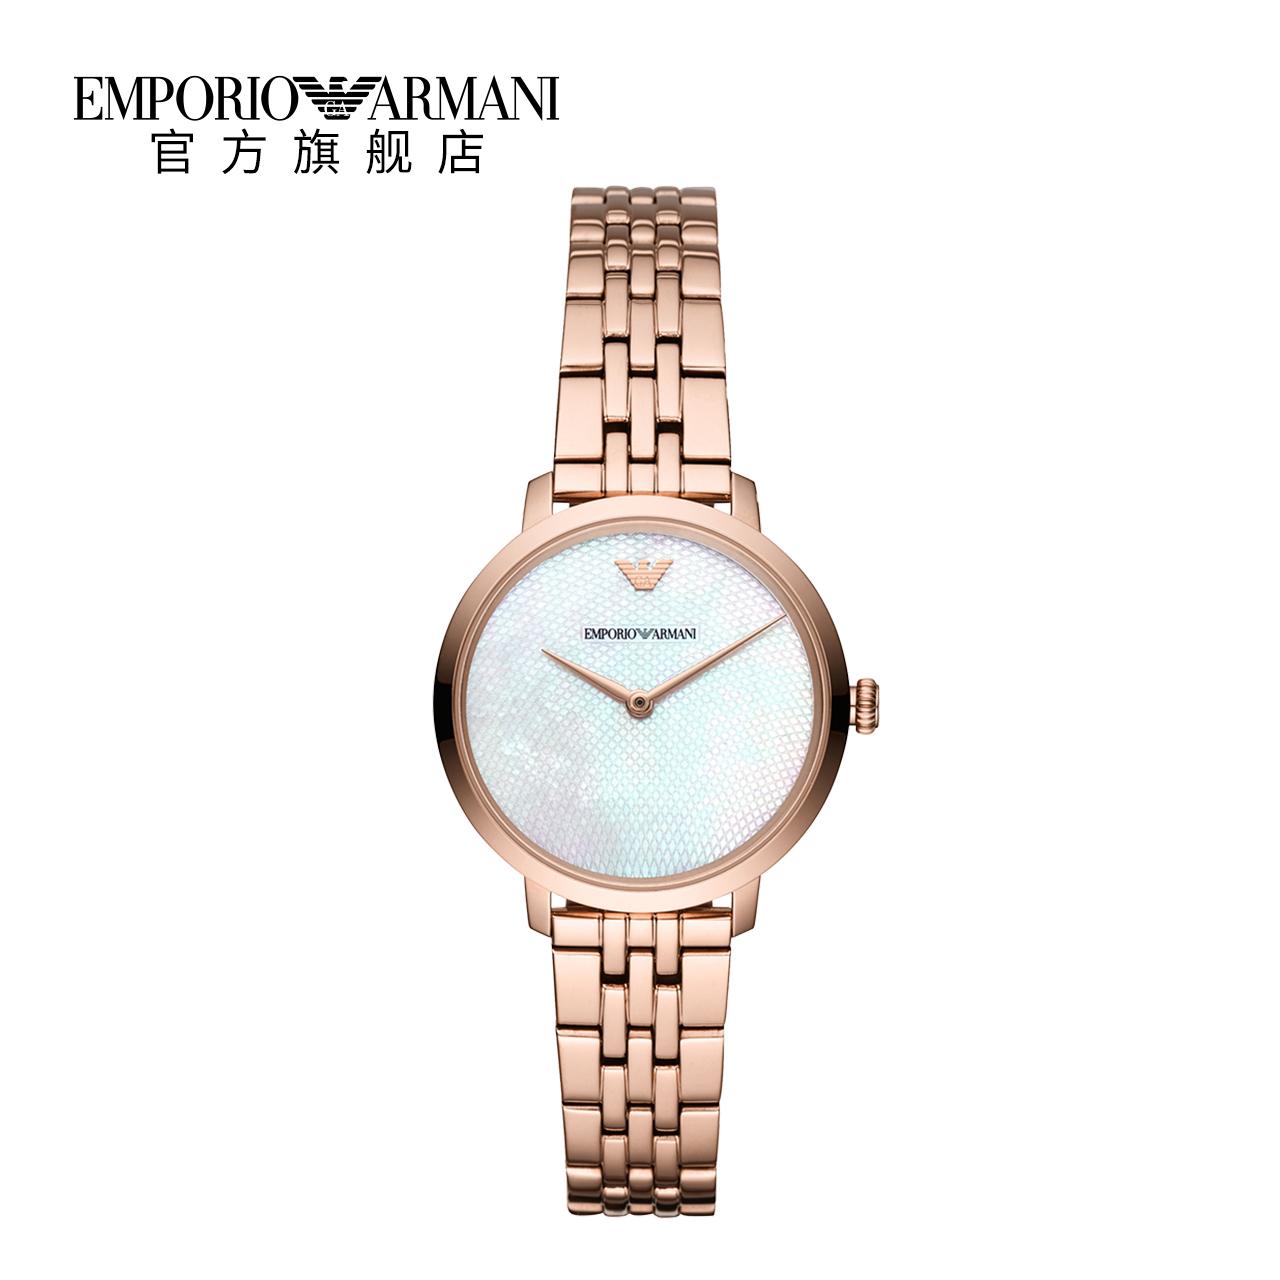 Armani 阿玛尼纹理贝母盘手表女 钢带玫瑰金腕表AR11158